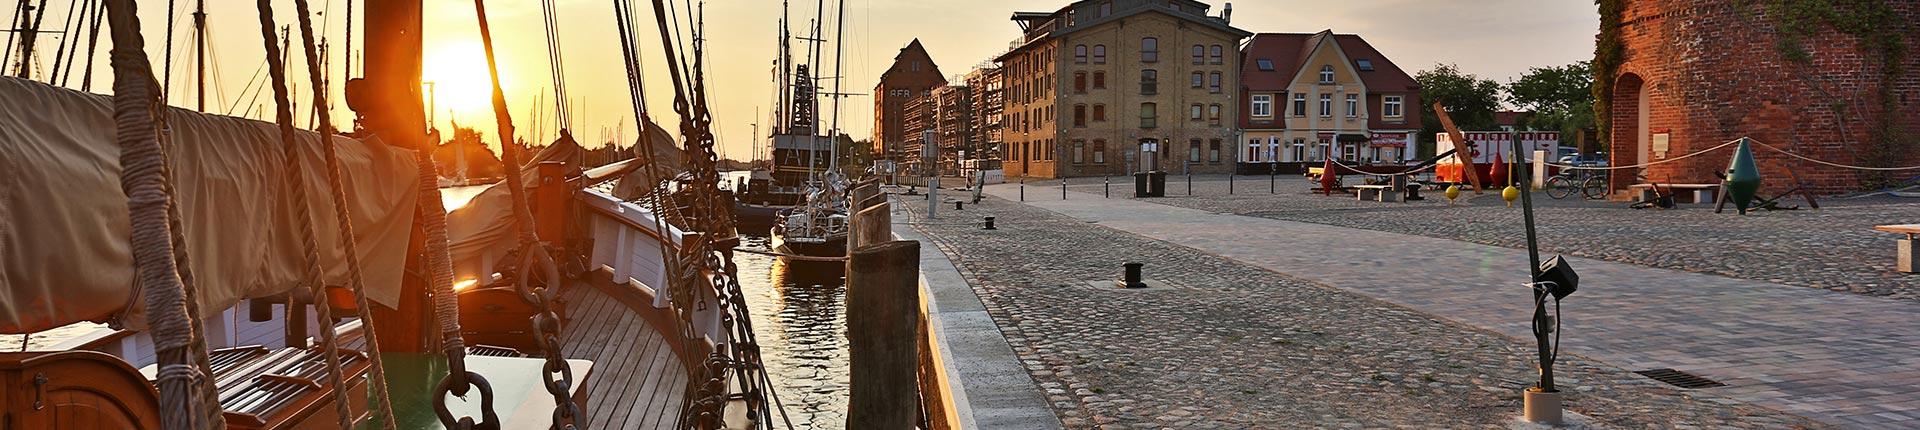 Museumshafen & Fangenturm